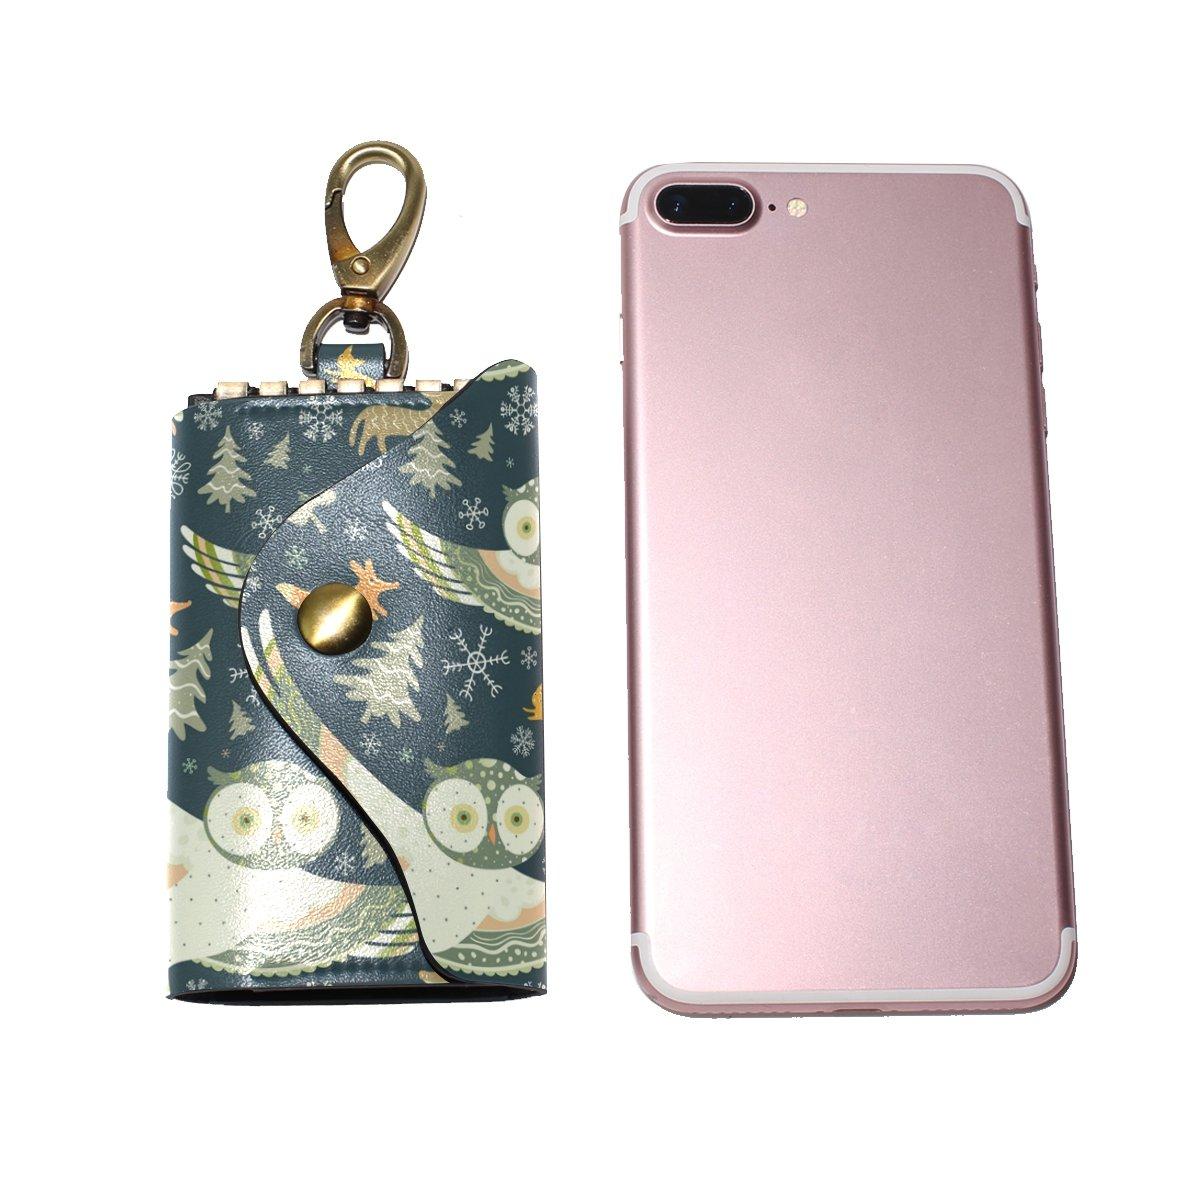 DEYYA Trendsetter Owl Leather Key Case Wallets Unisex Keychain Key Holder with 6 Hooks Snap Closure